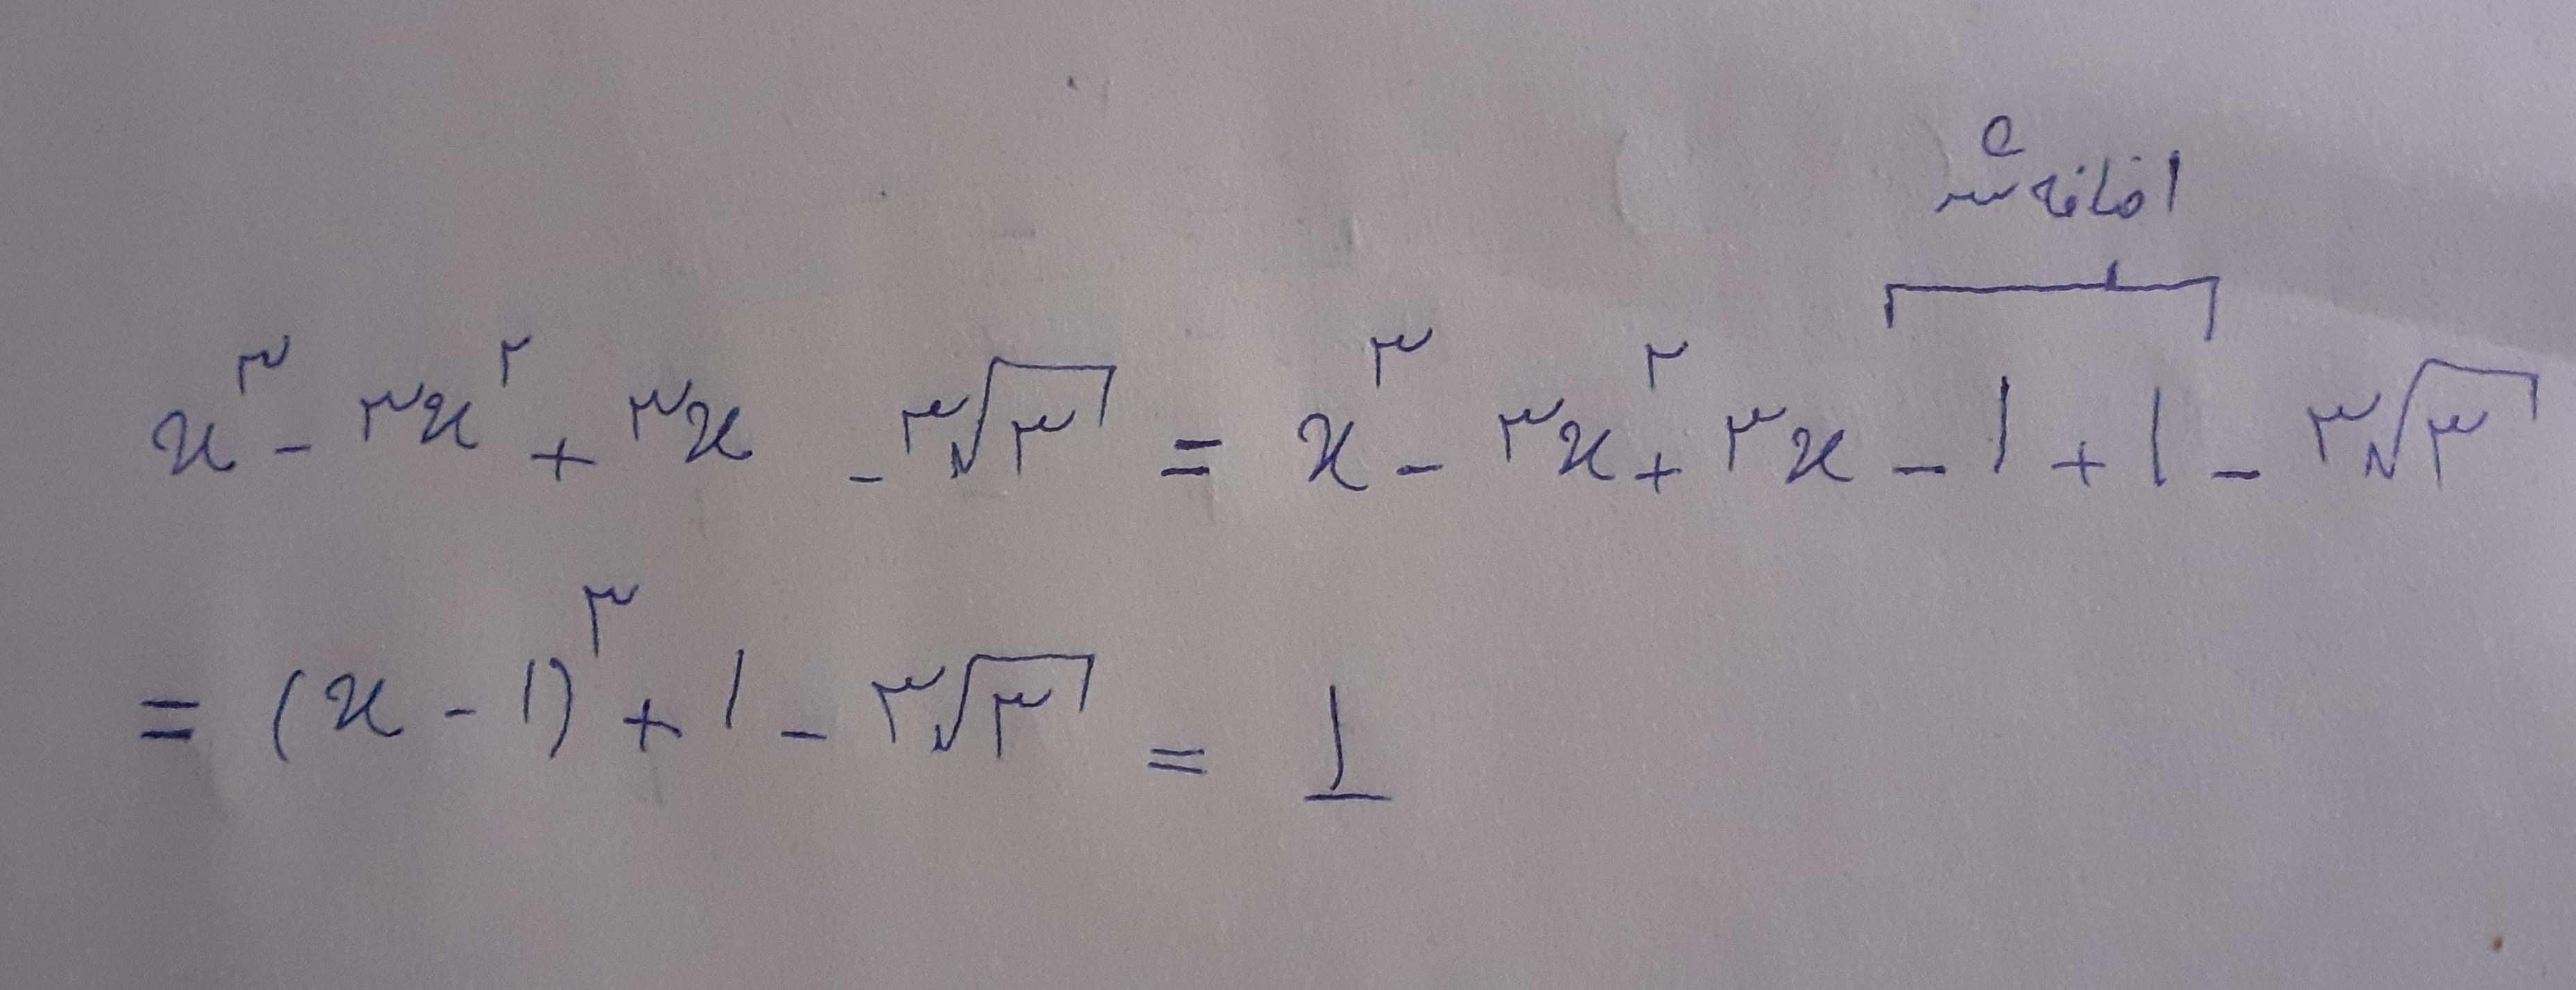 جواباون بخش اضافه شده کمک میکنه تا معادله رو به اتحاد تبدیل بکنیم👌🌺